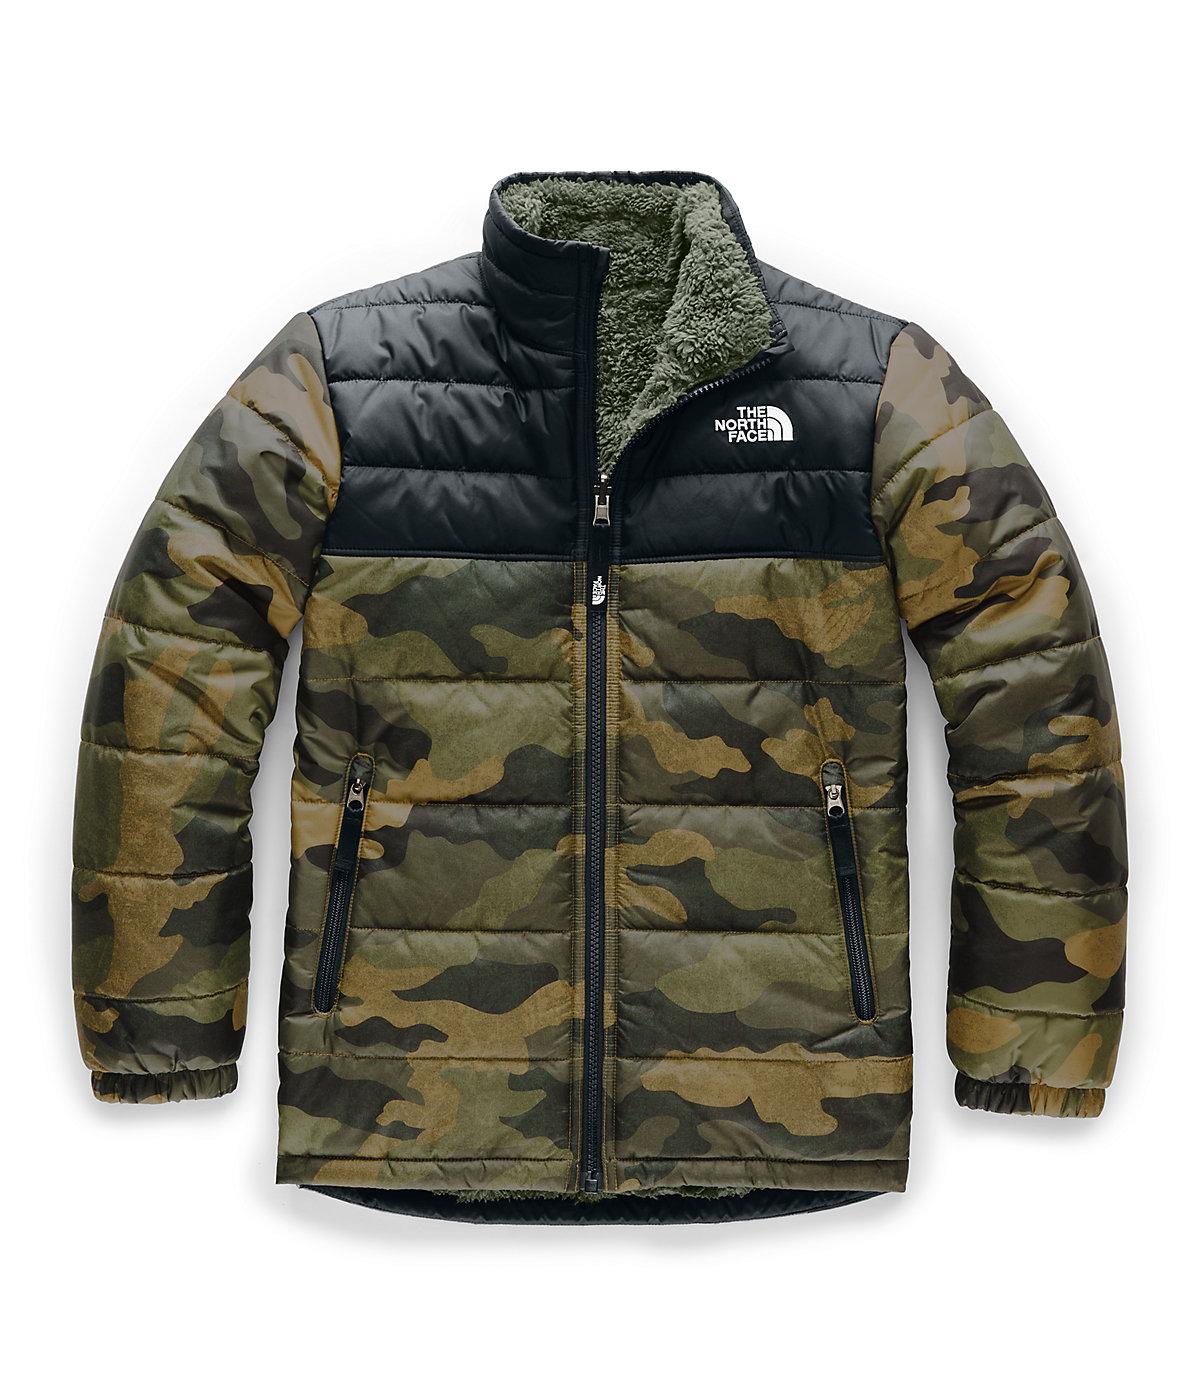 Boys Reversible Mount Chimborazo Jacket The North Face Stand Collar Jackets Collar Jackets Reversible Jackets [ 1396 x 1200 Pixel ]